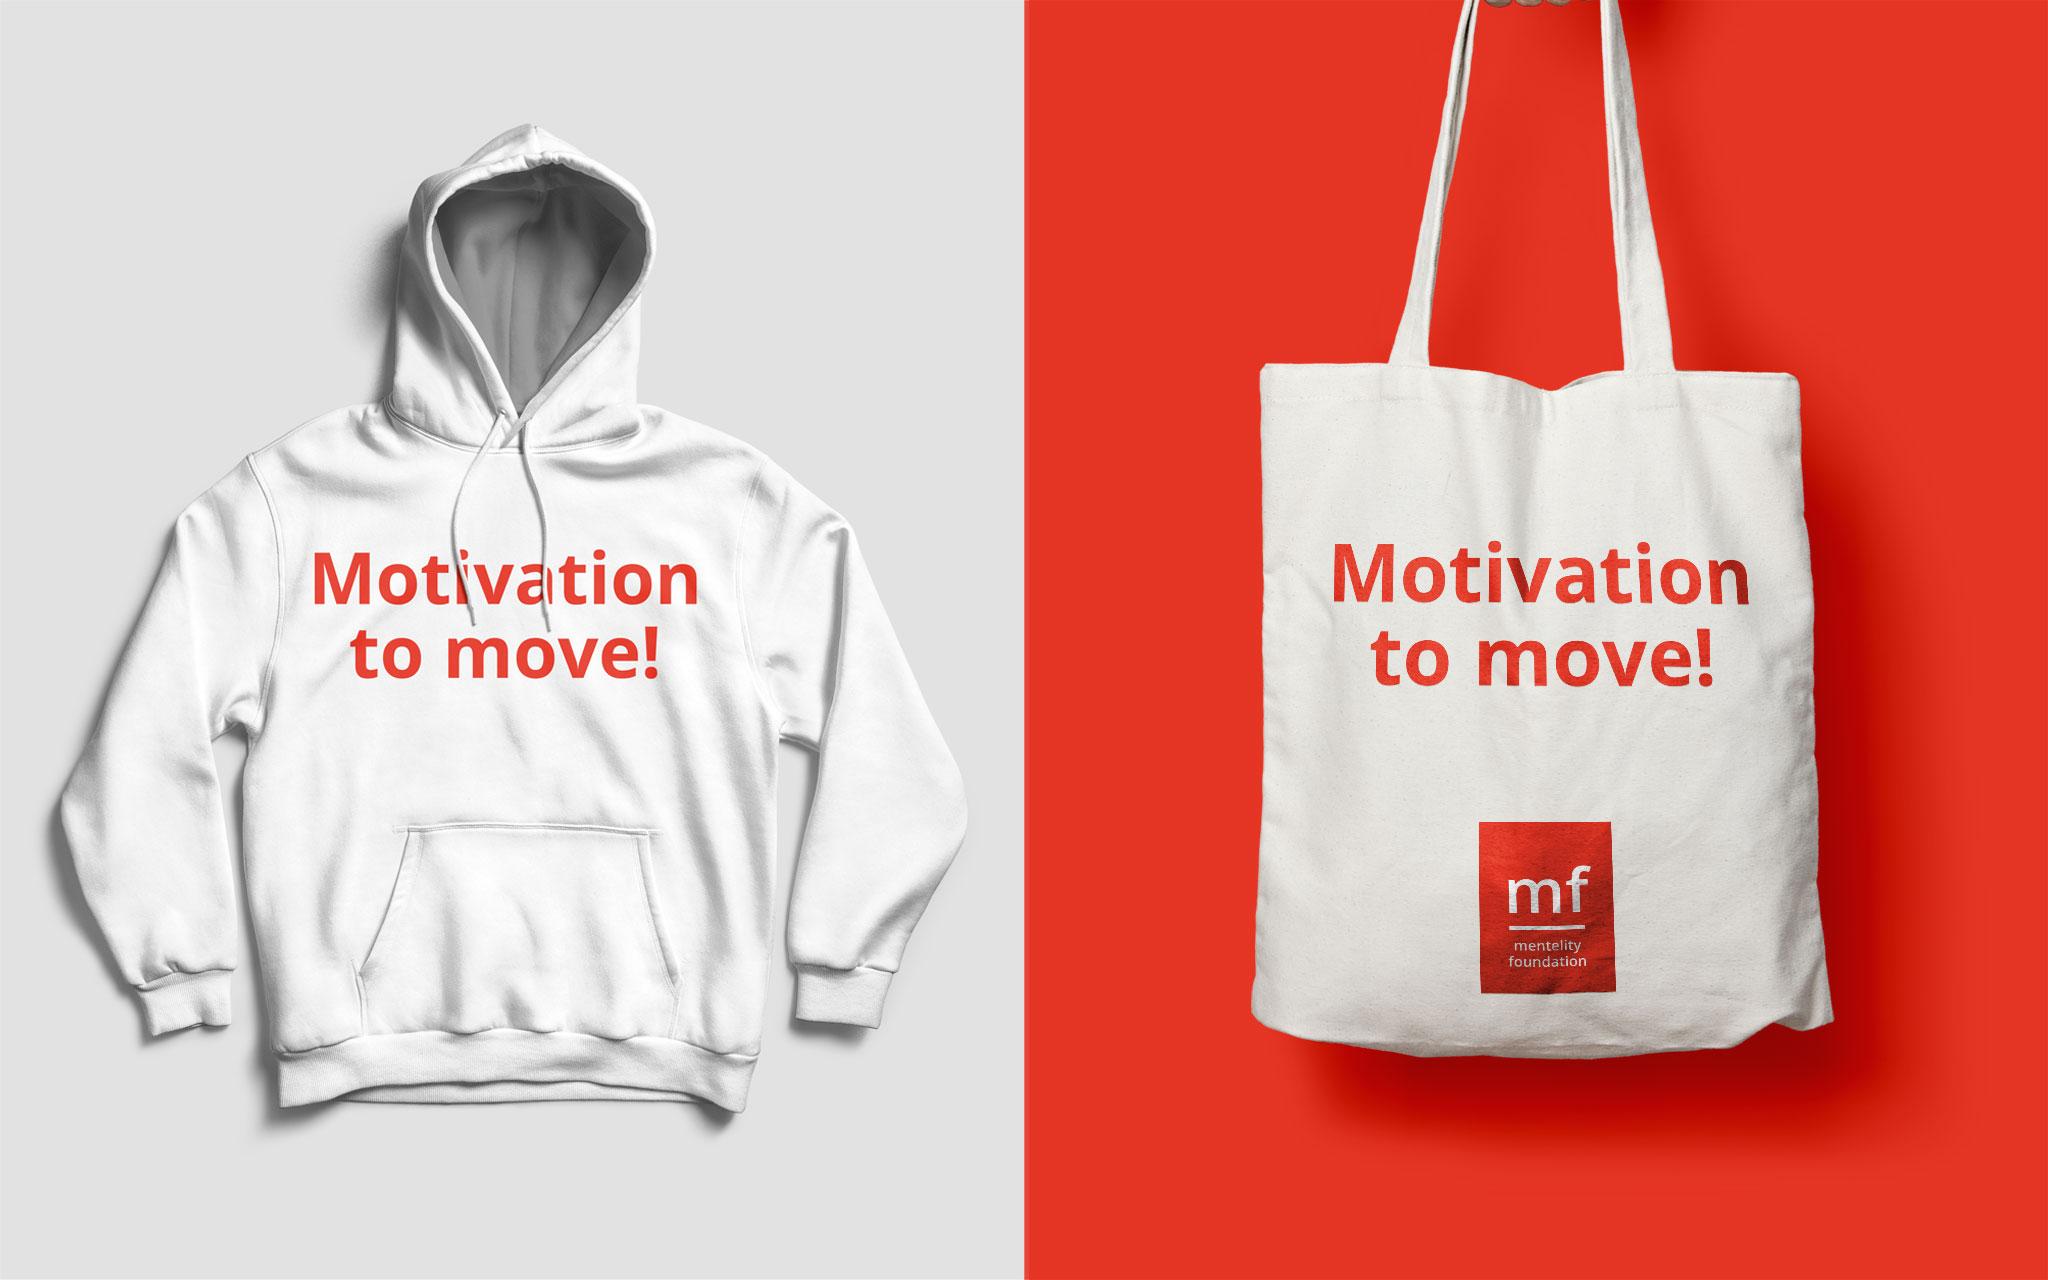 Mentelity Foundation visuele identiteit